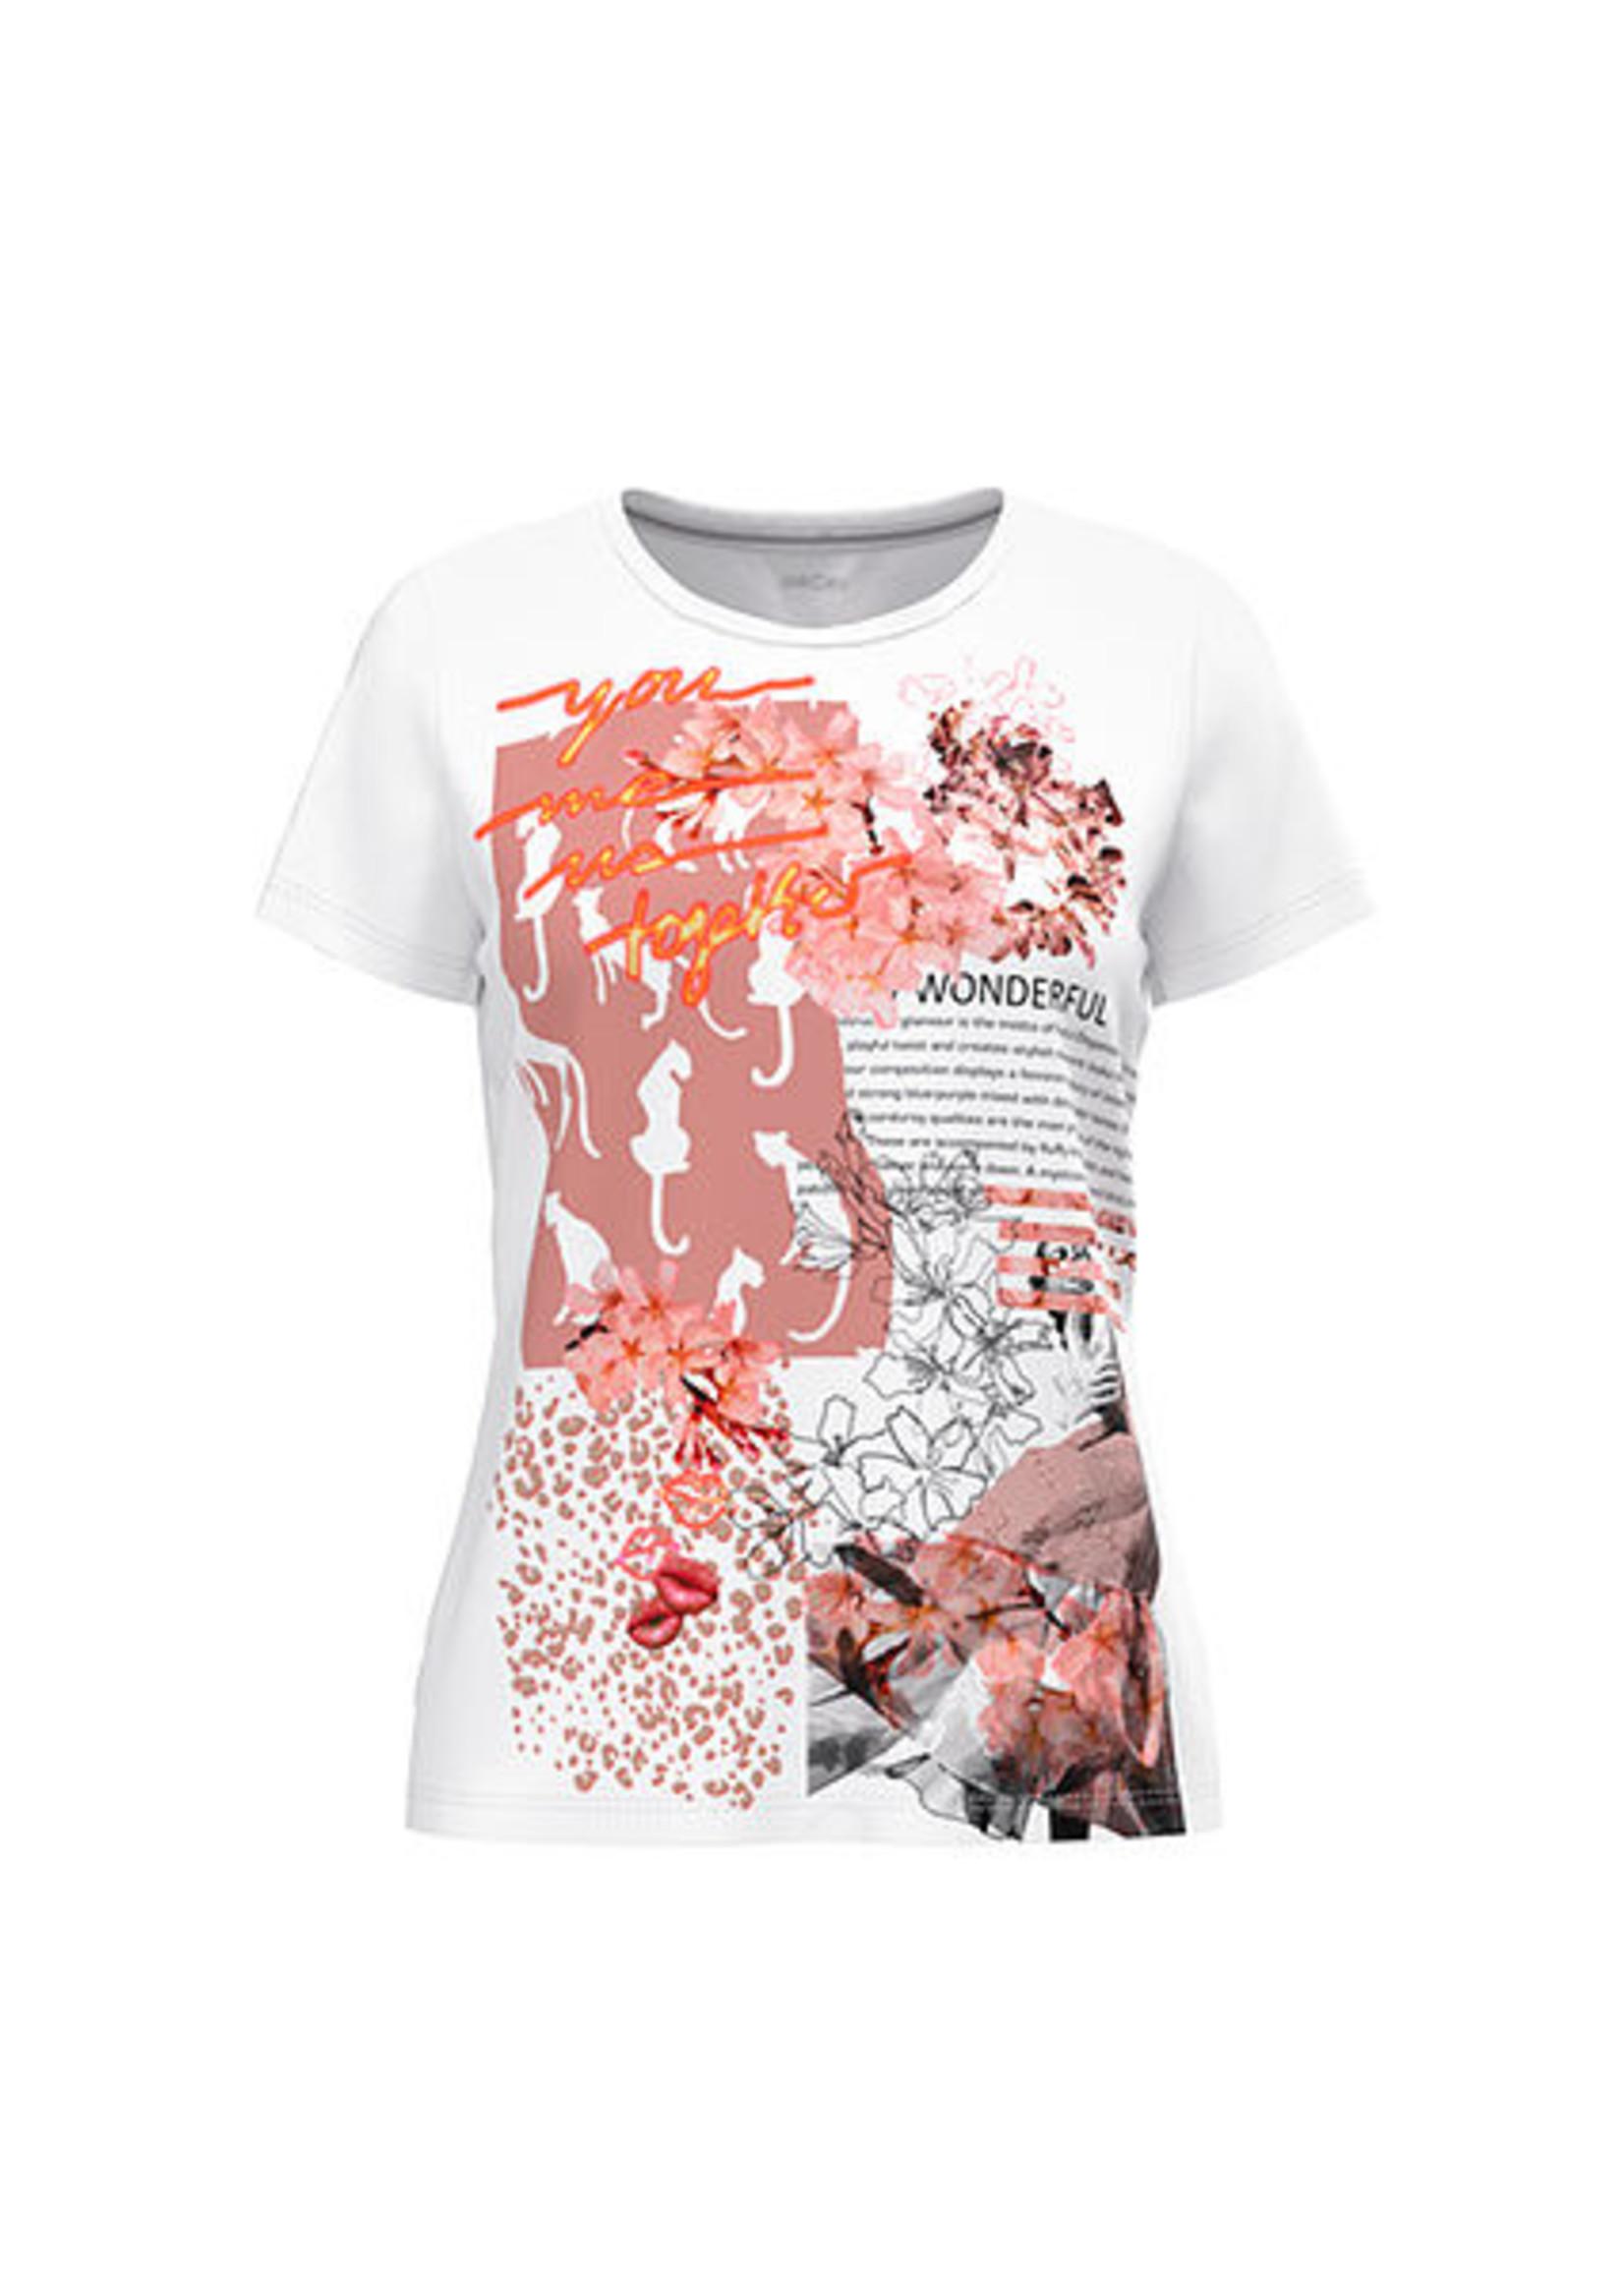 T-shirt RC 48.32 J94 make up